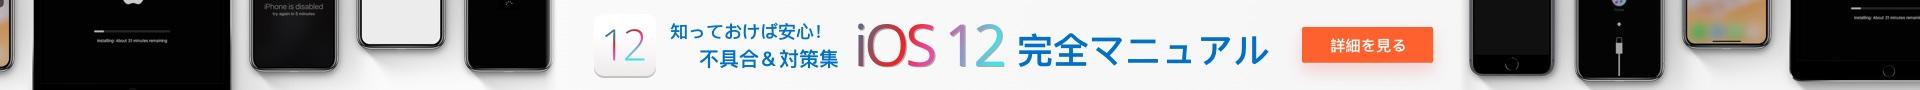 iOS 12 & 新型iPhone 2018